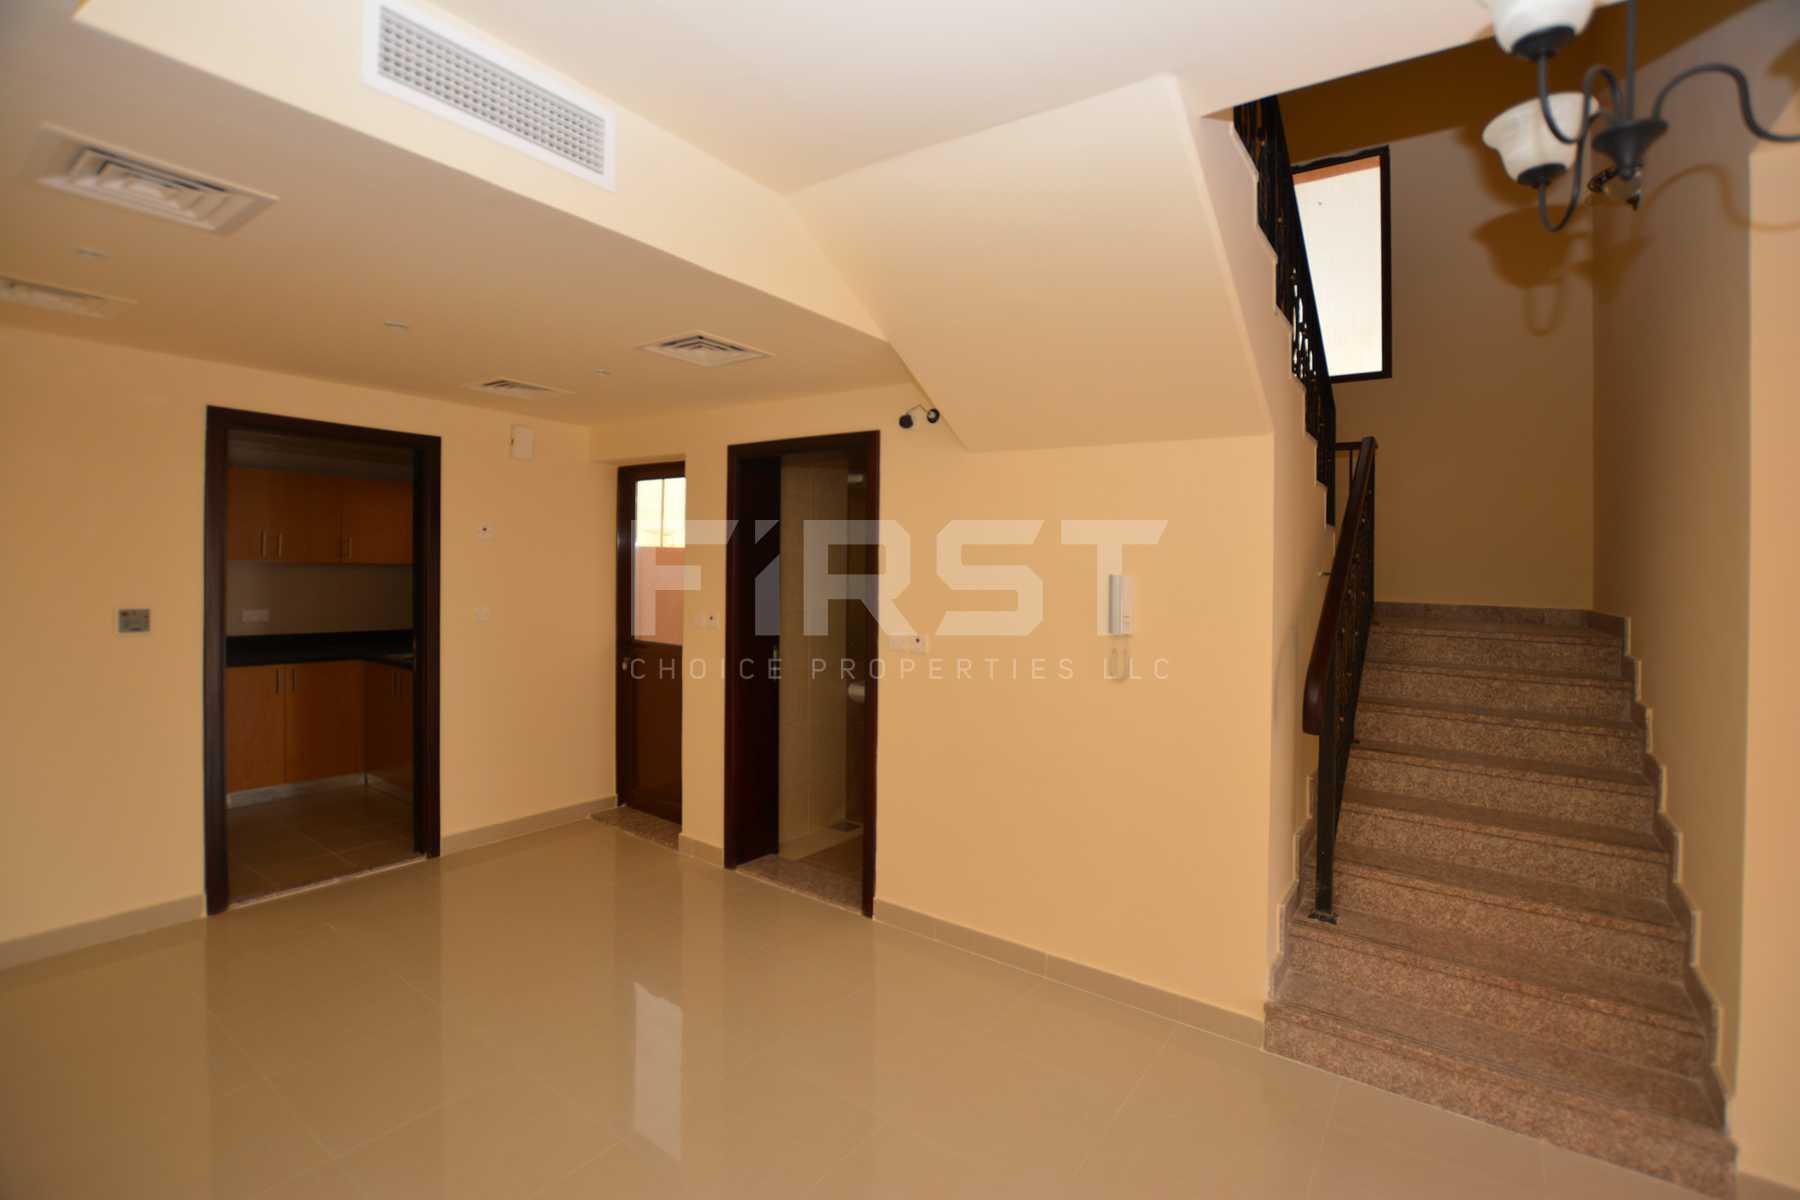 Internal Photo of 2 Bedroom Villa in Hydra Village Abu Dhabi UAE (13).jpg